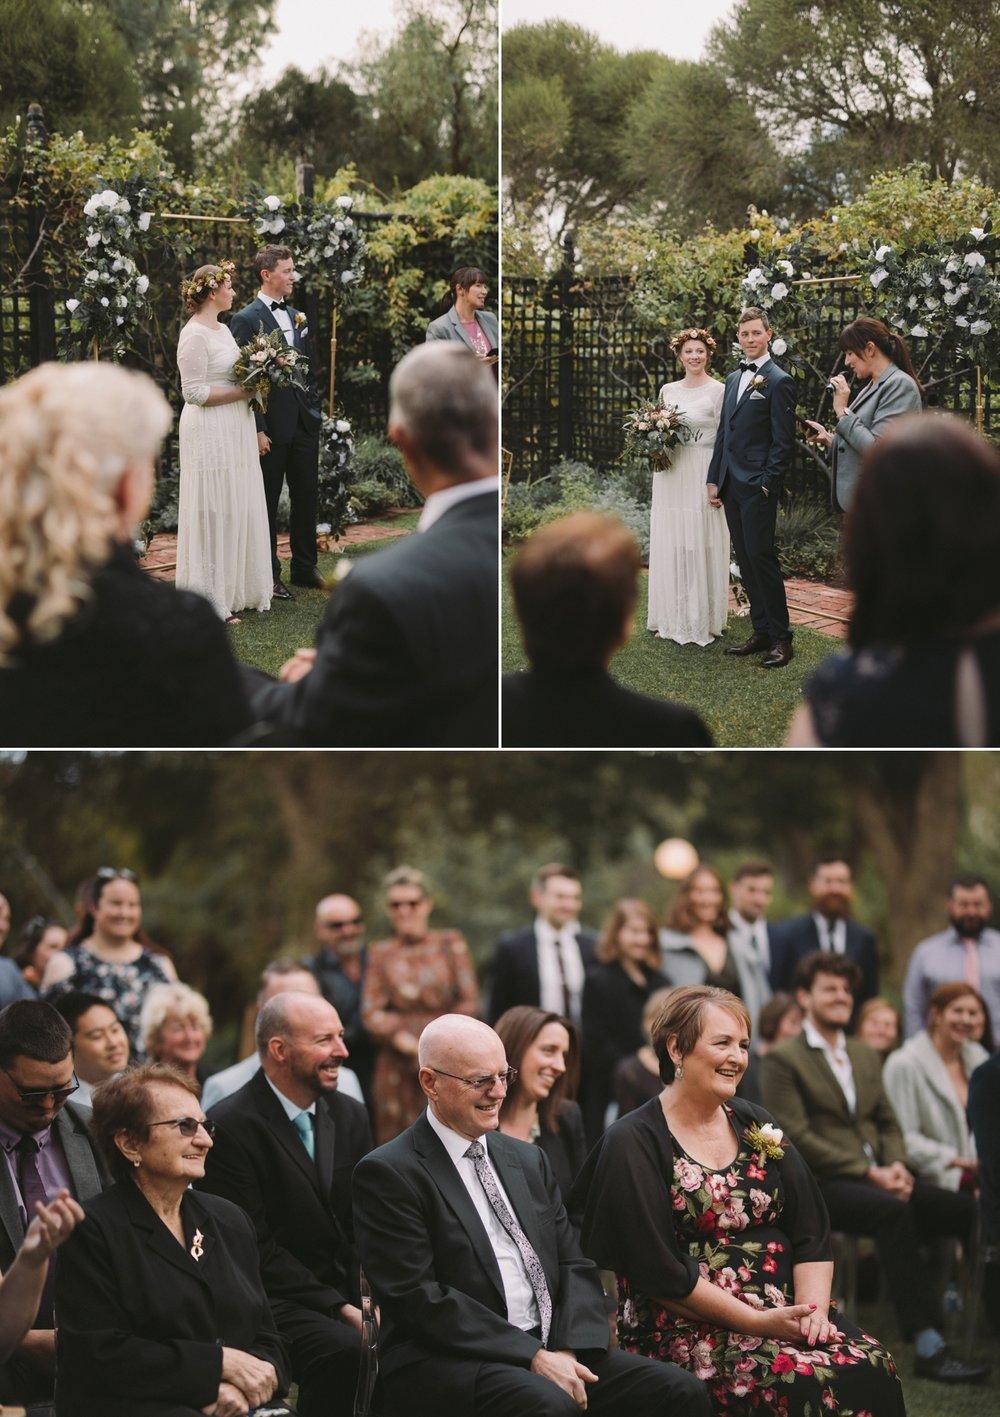 Jo & Aaron - Natural Wedding Photography in Adelaide - Beautiful, modern wedding photographer - Al Ru Farm Wedding Photography - Katherine Schultz_0014.jpg